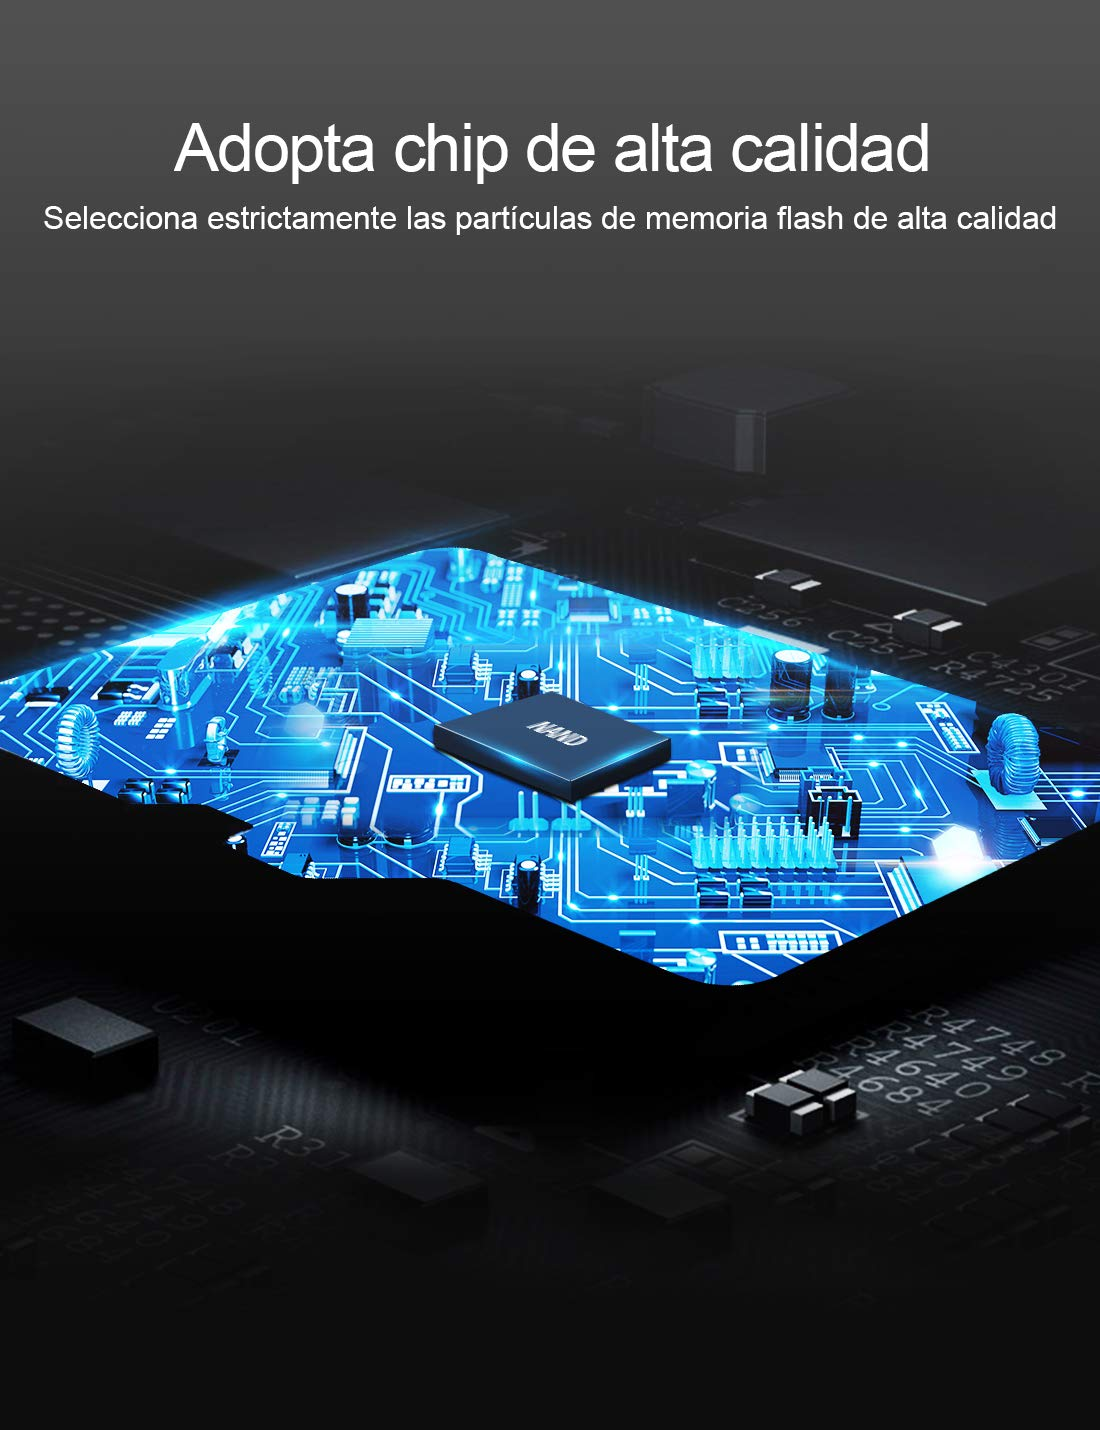 UHS-I Velocidad de Lectura hasta 100 MB//s A1, U3, C10, V30, 4K, 667X Tarjeta Memoria microSDXC Dashcam Gopro Netac Tarjeta de Memoria de 128GB Tarjeta TF para M/óvil Switch C/ámara Deportiva